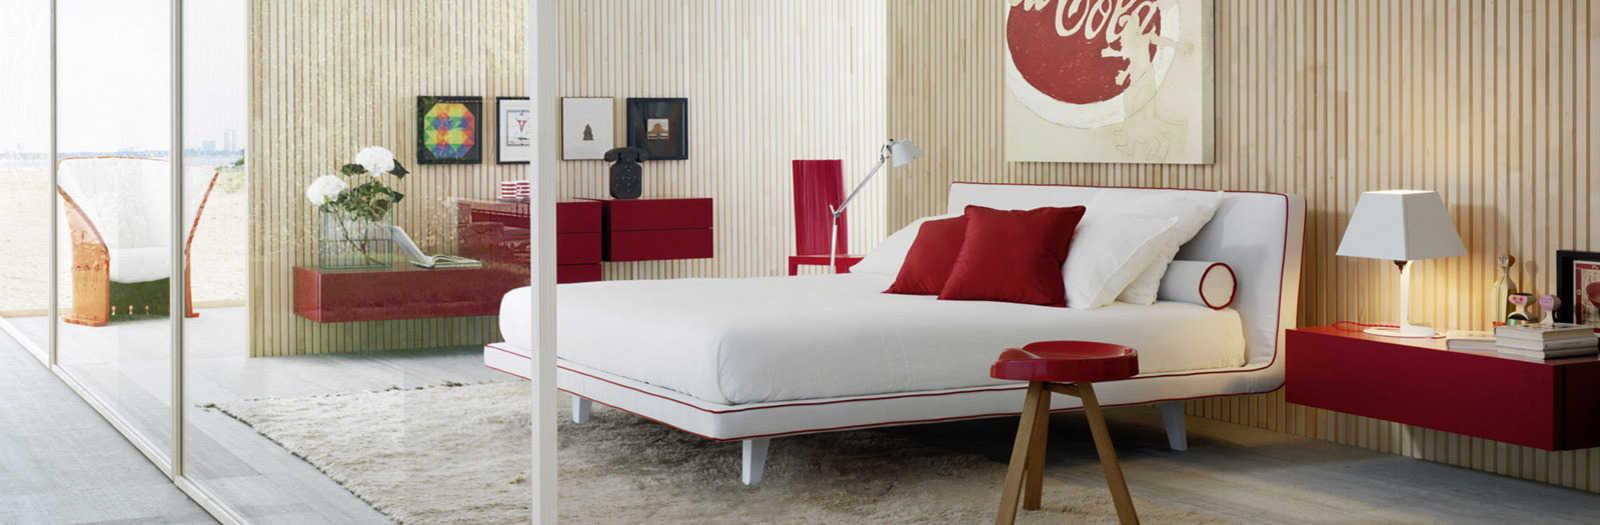 camere-stile-moderno-2